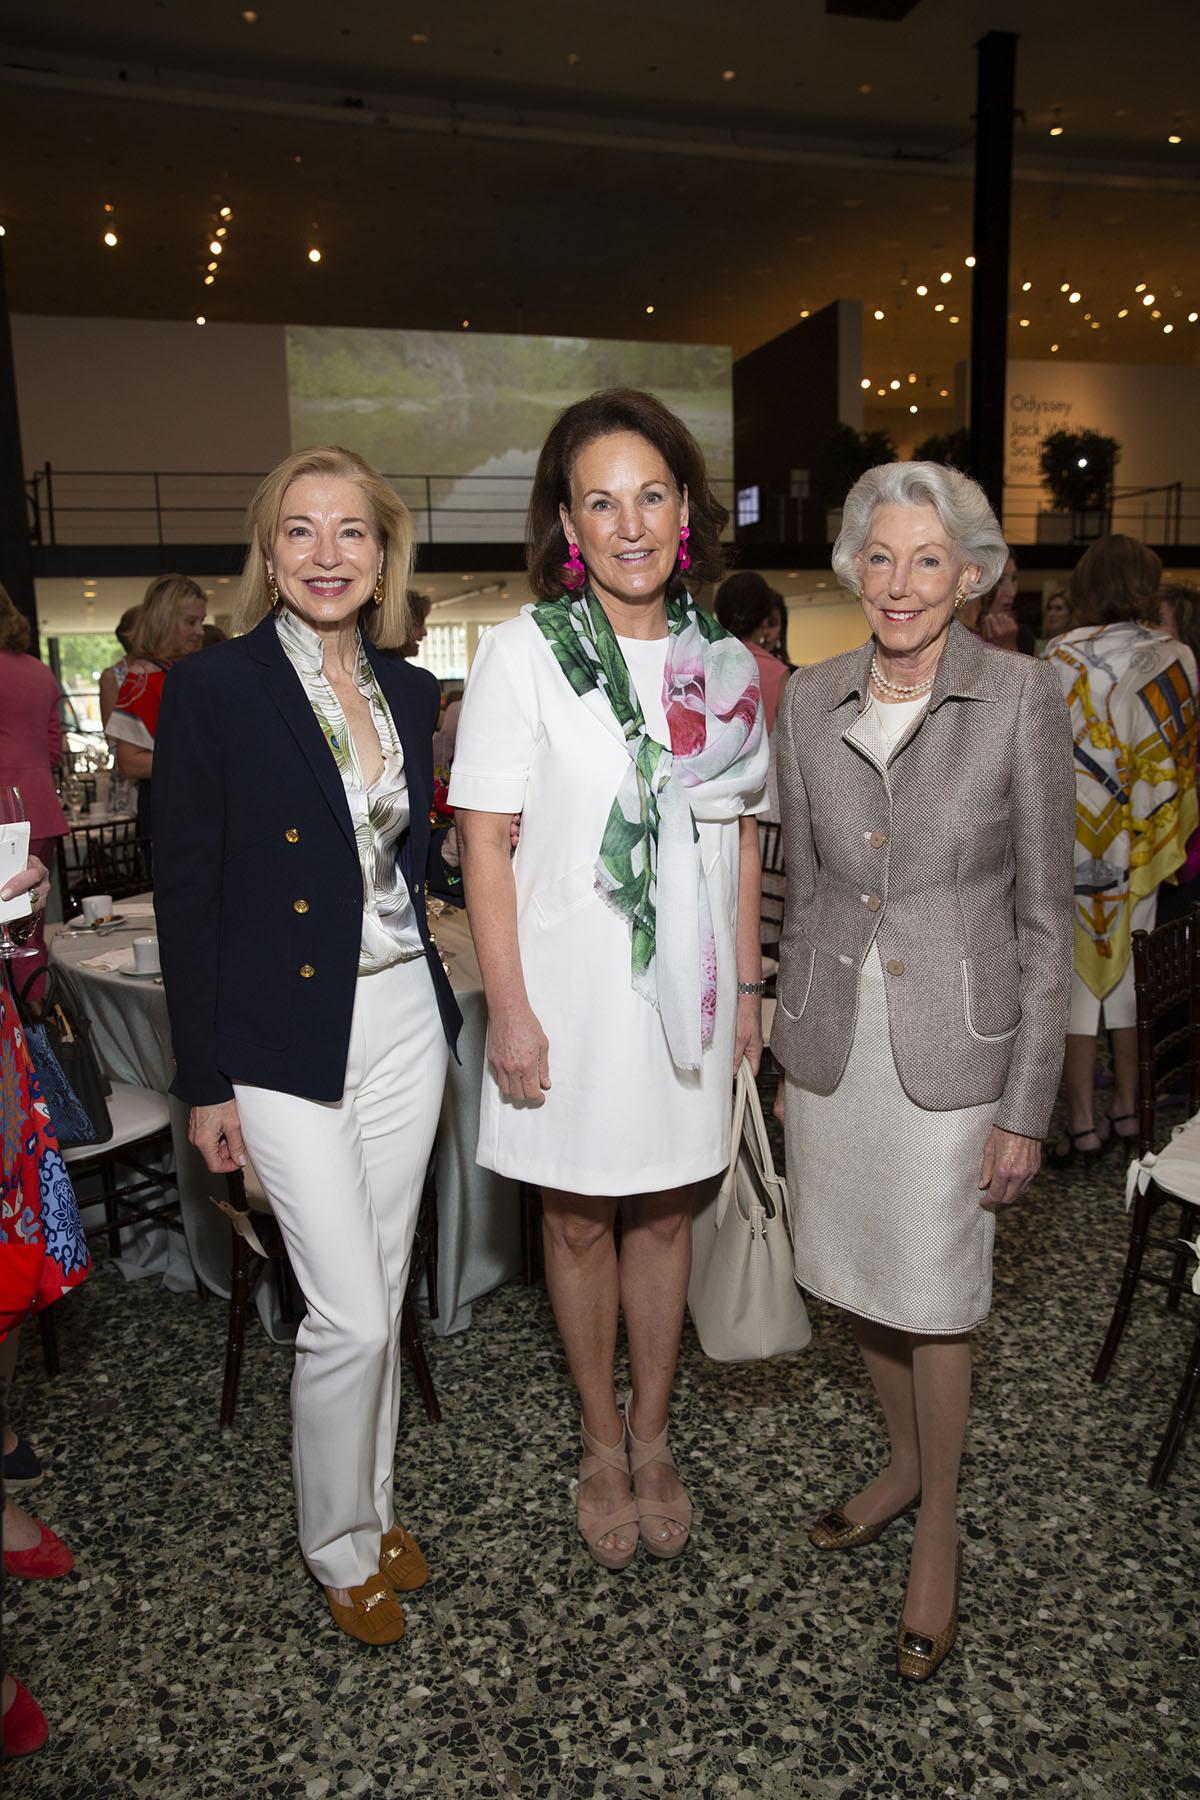 Meredith Cocke, Terry Smith and Lynda Underwood